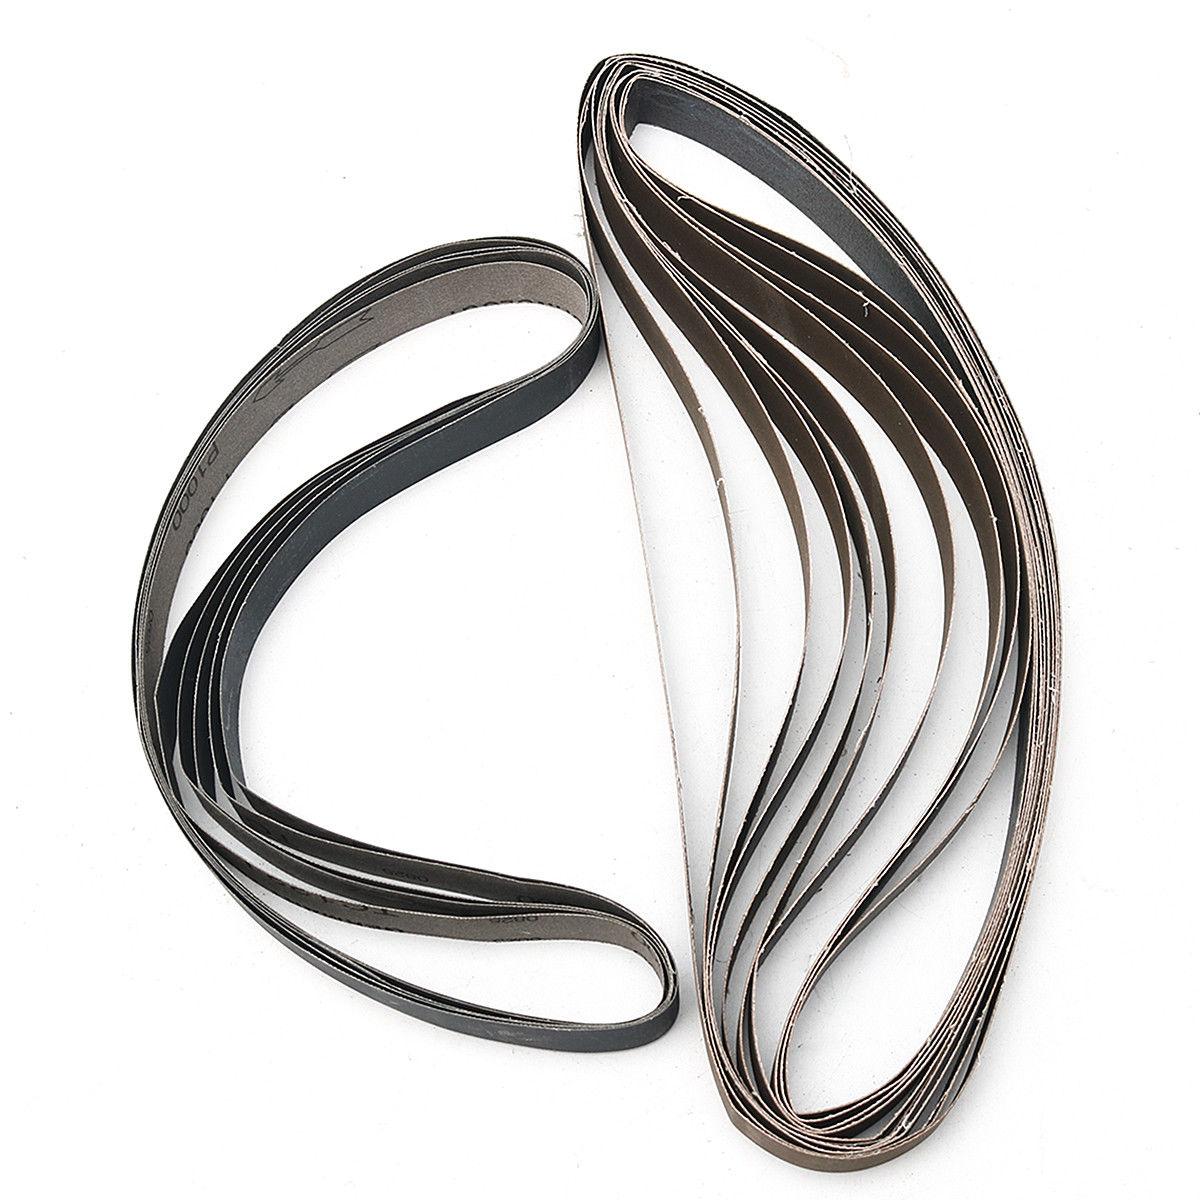 15pcs1x30 Sanding Sander Belts 600 800 1000 High Grit Polishing Aluminum Oxide